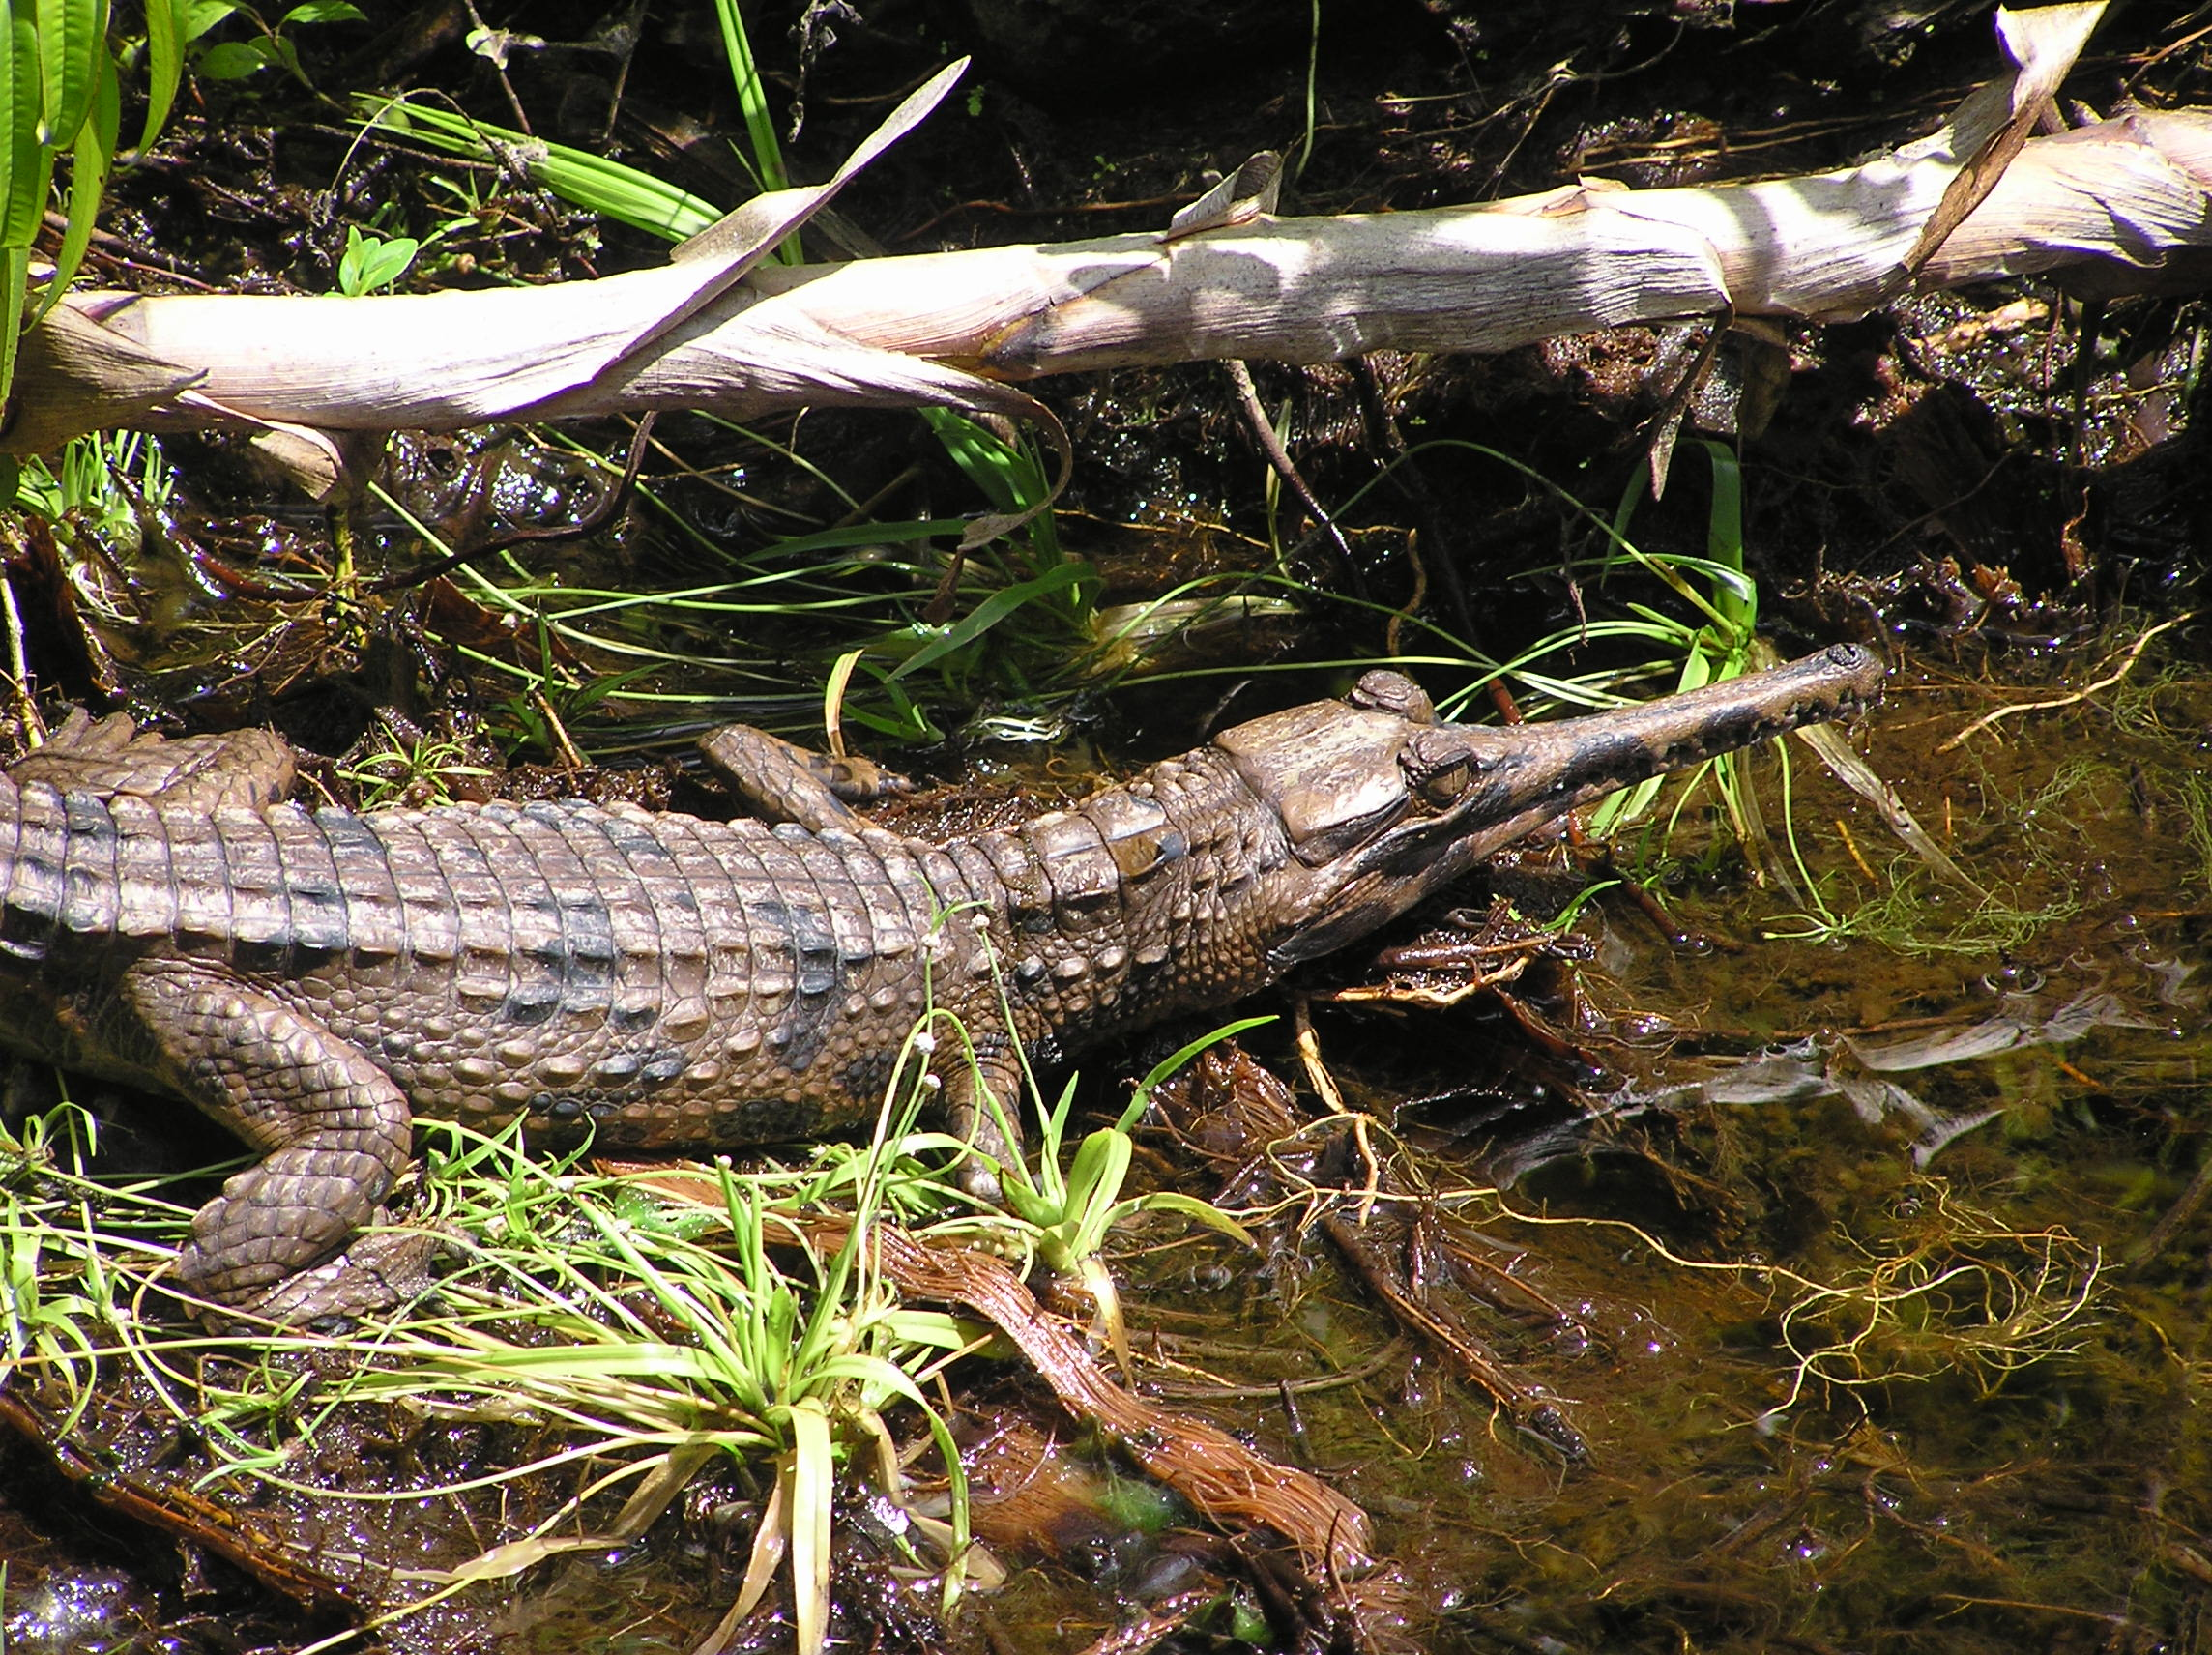 Long Nosed Crocodile 4